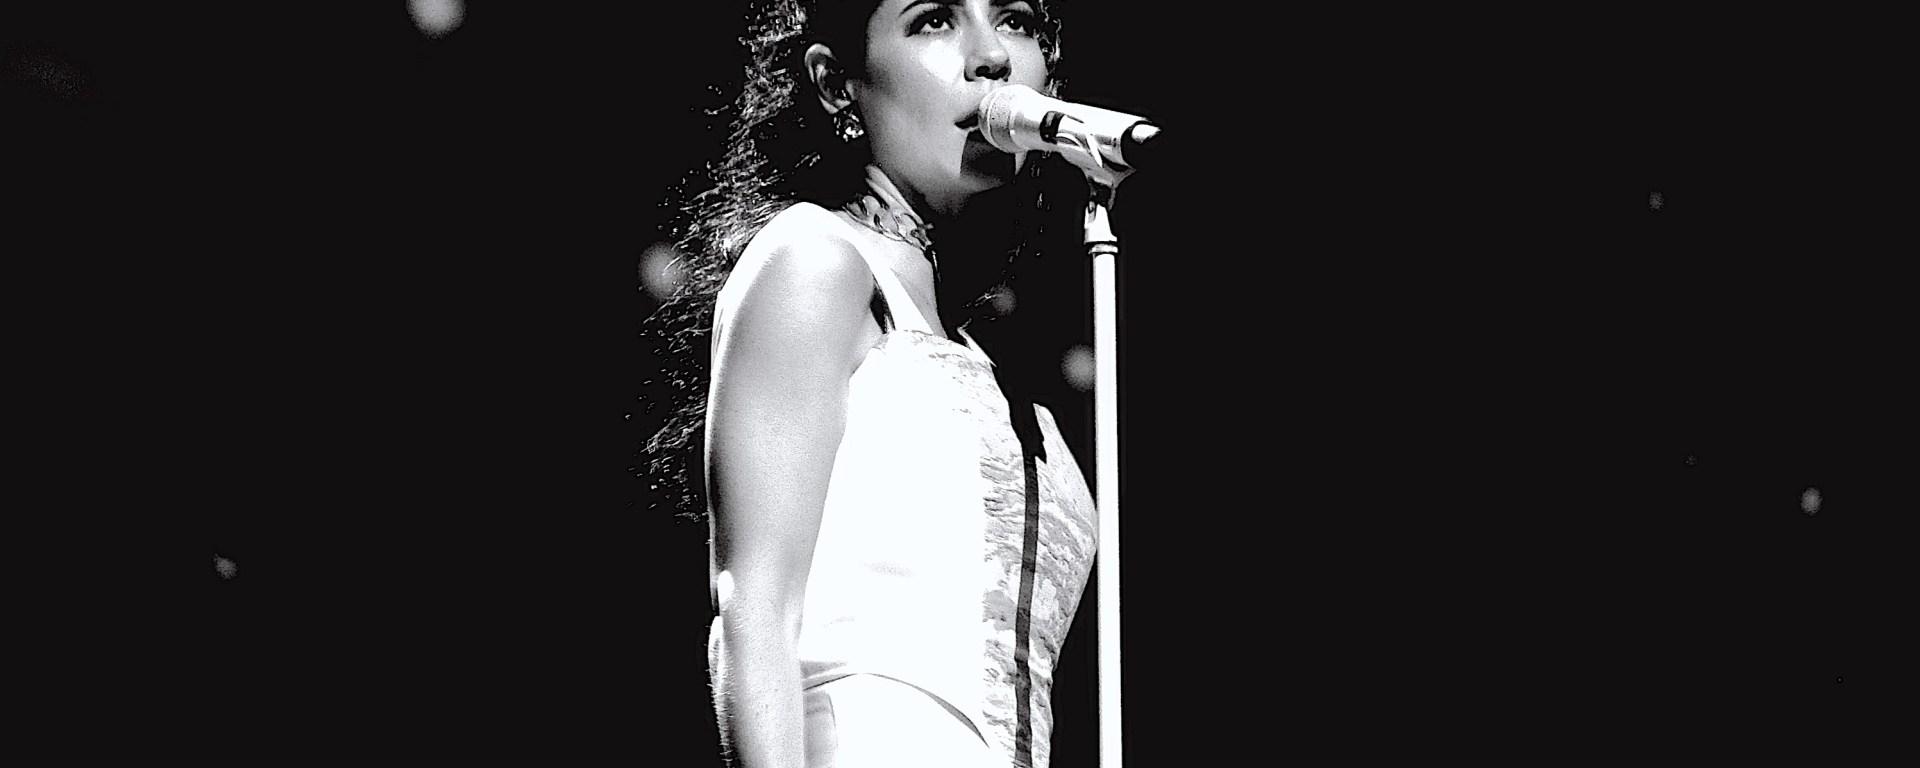 Black and white photo of Marina Diamandis singing on a stage.